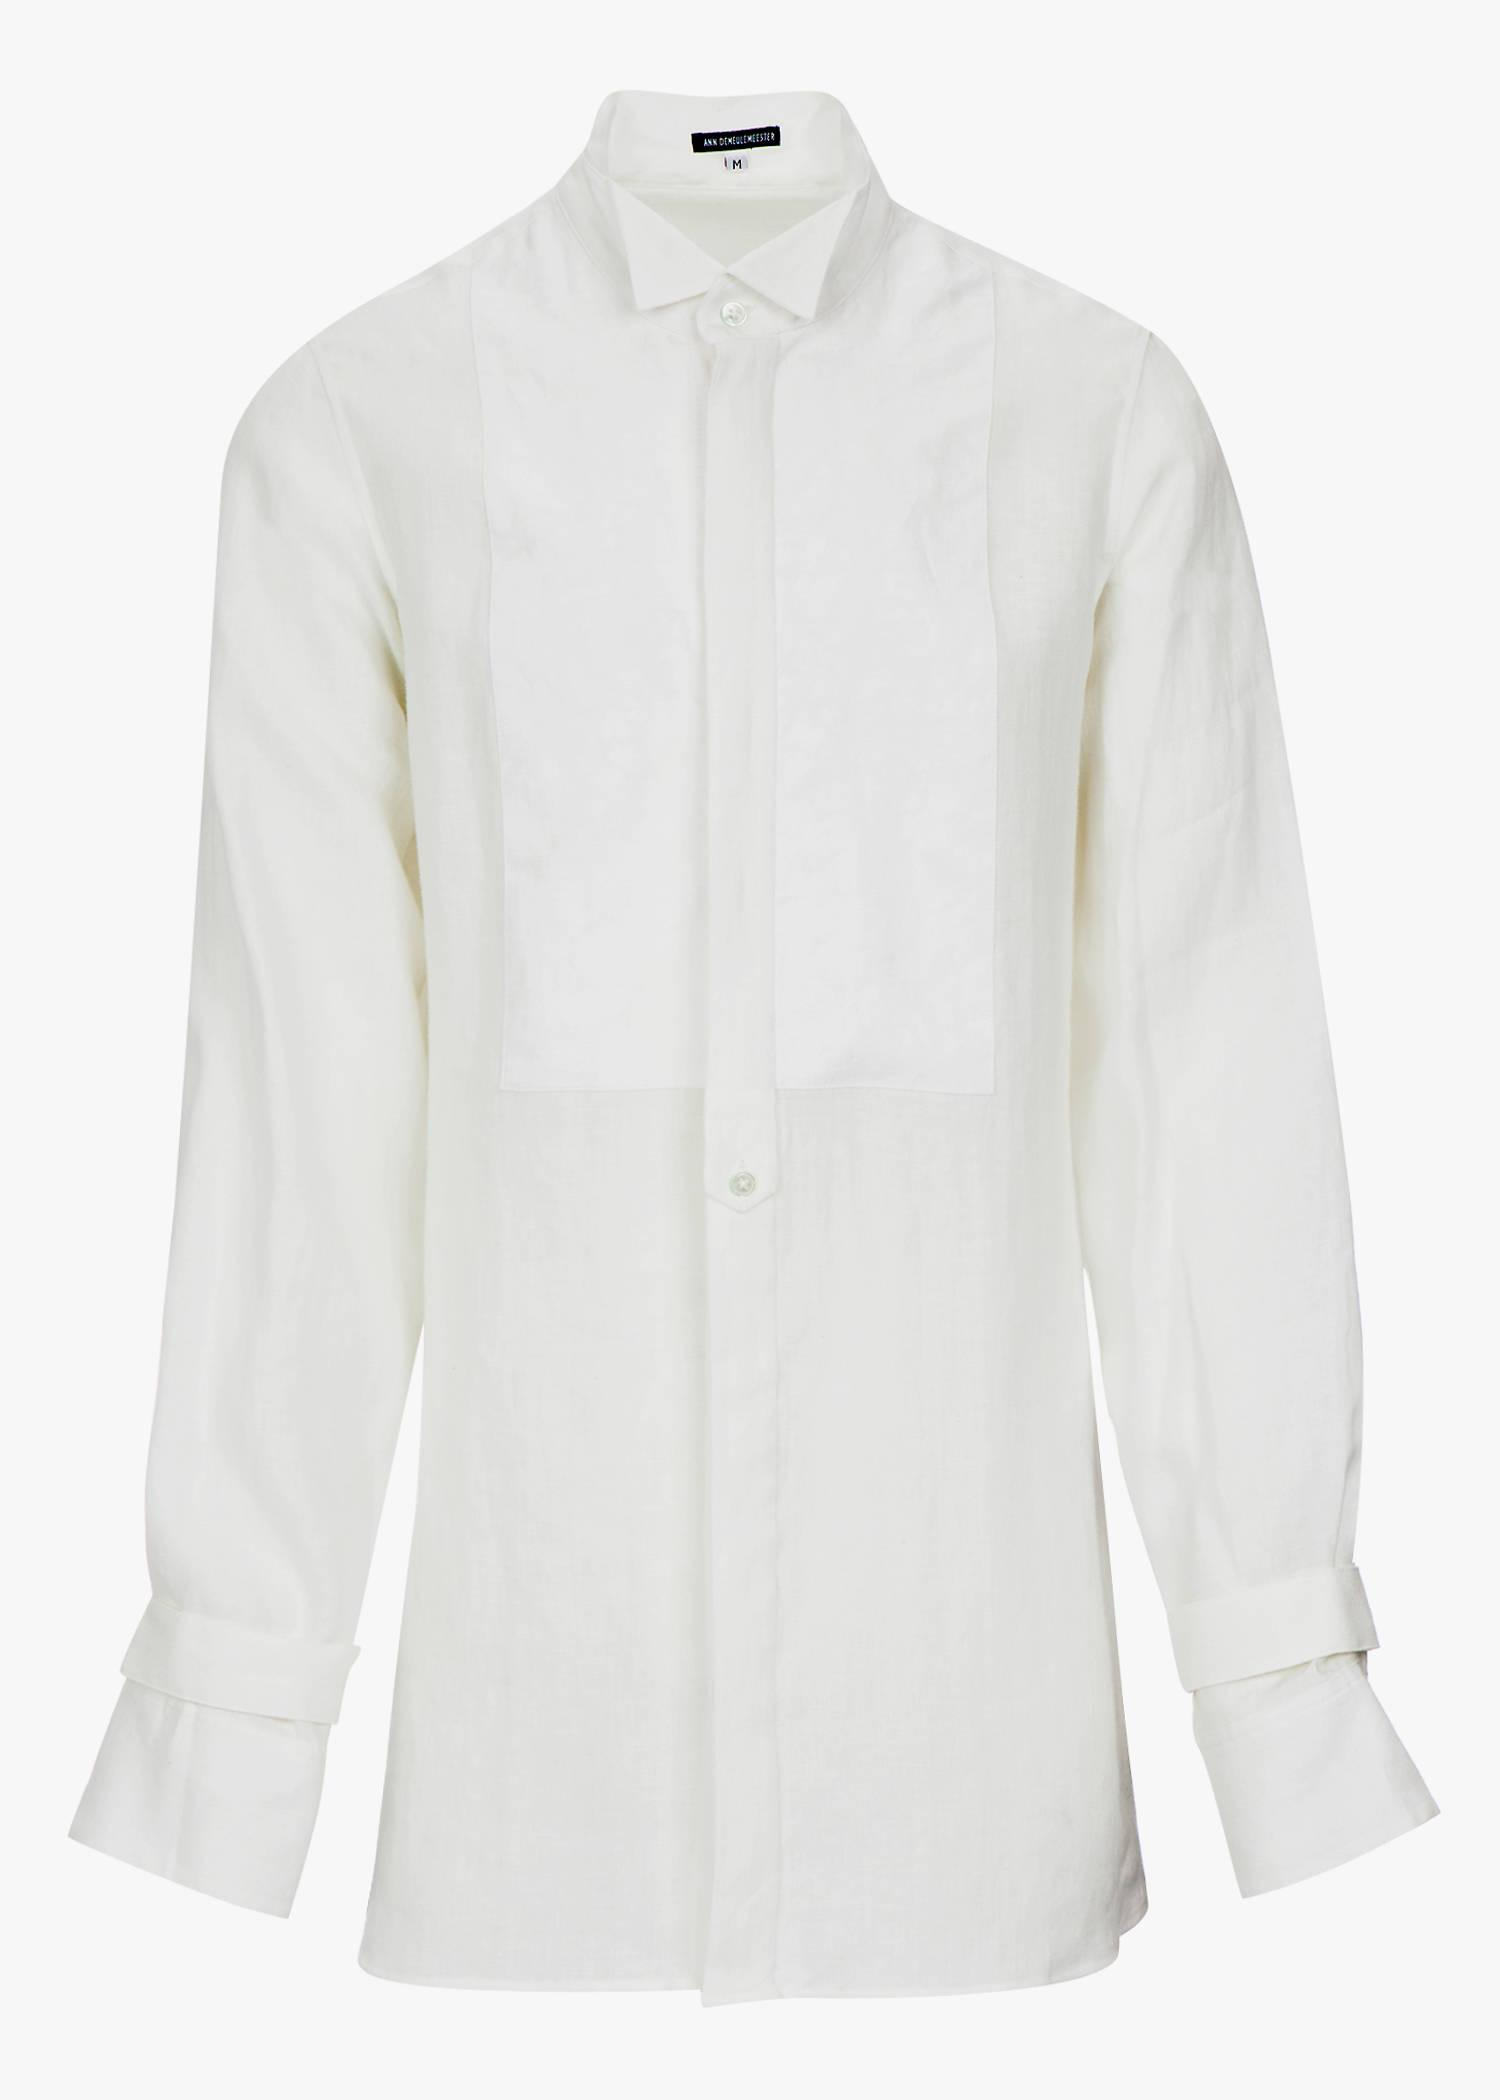 Ann Demeulemeester Light Brushed Shirt In Off White